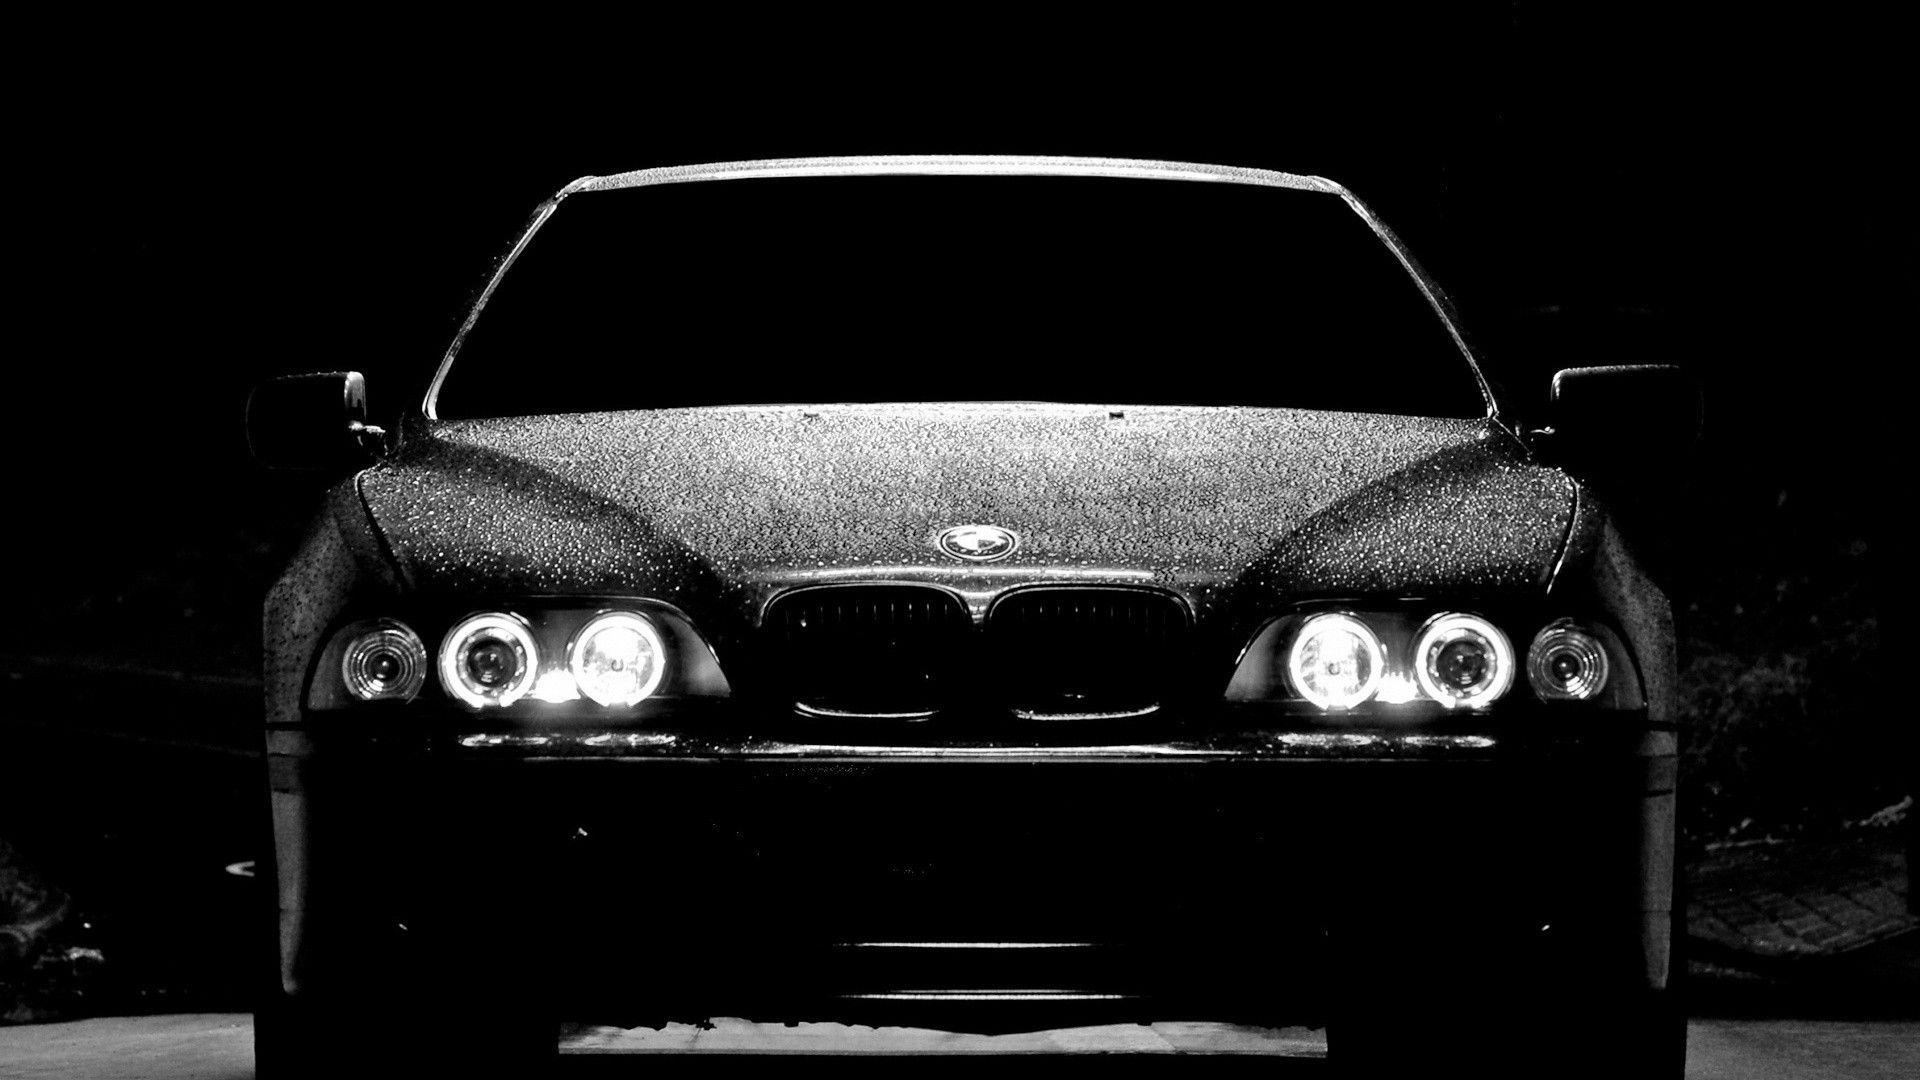 Cars Bmw M5 Black Headlights Wallpaper Bmw Wallpapers Bmw Bmw M5